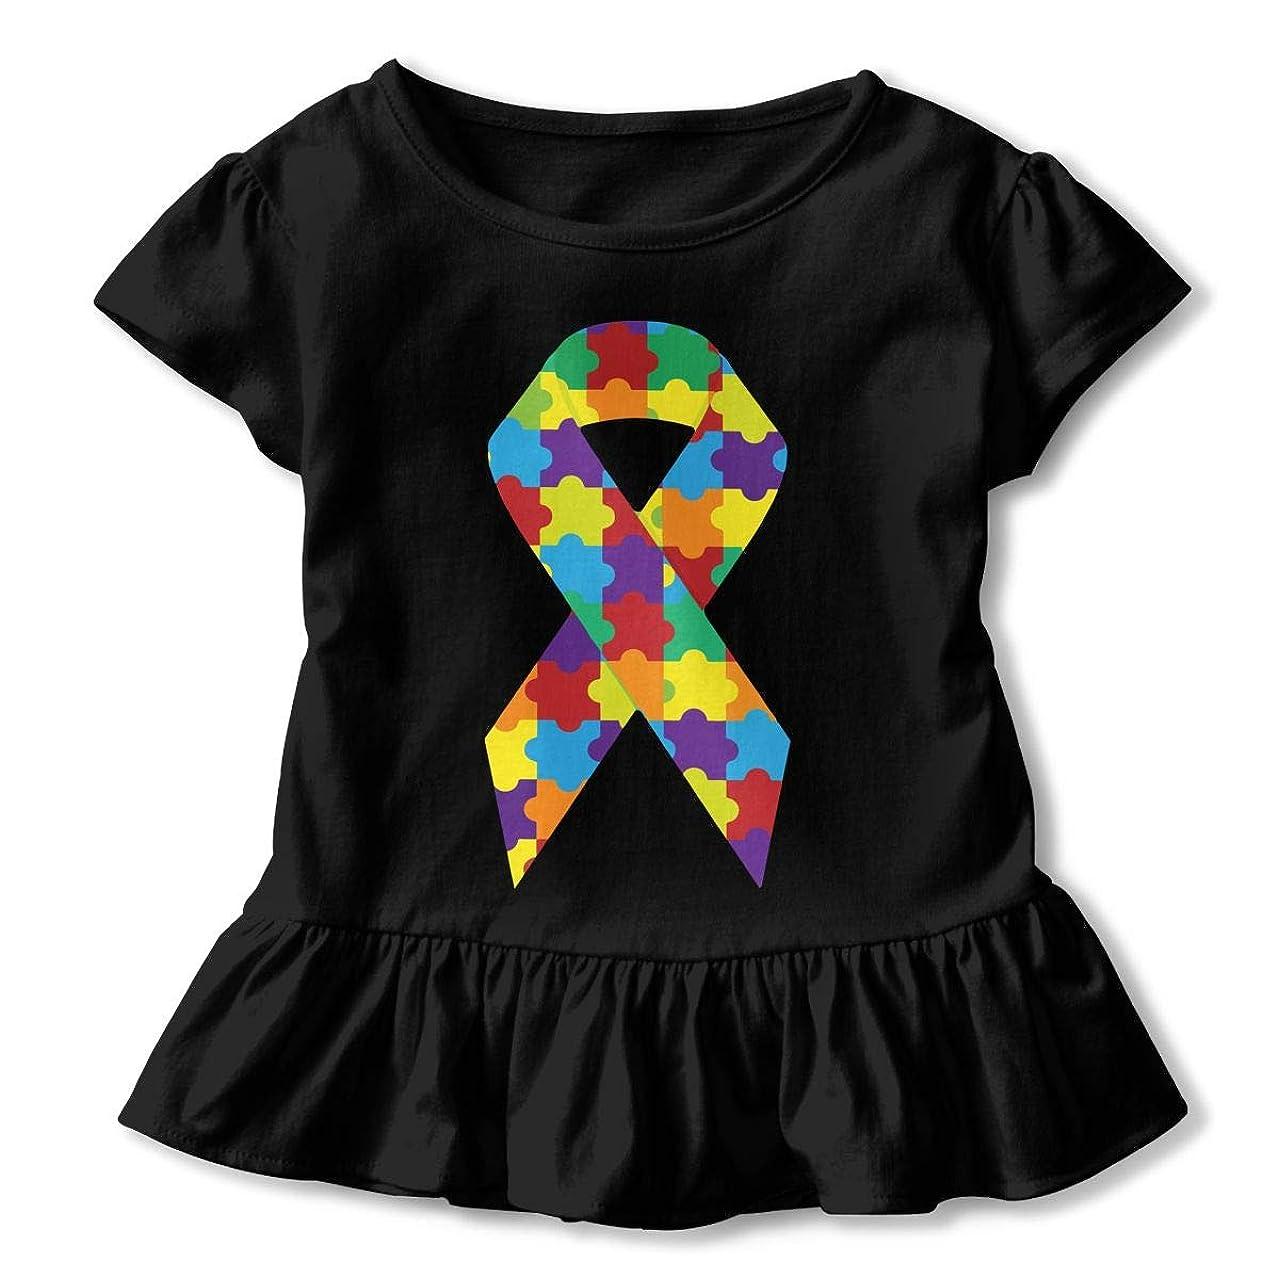 Puzzle Game Autism Day Kids Girls Short Sleeve T-Shirts Ruffles Shirt Tee